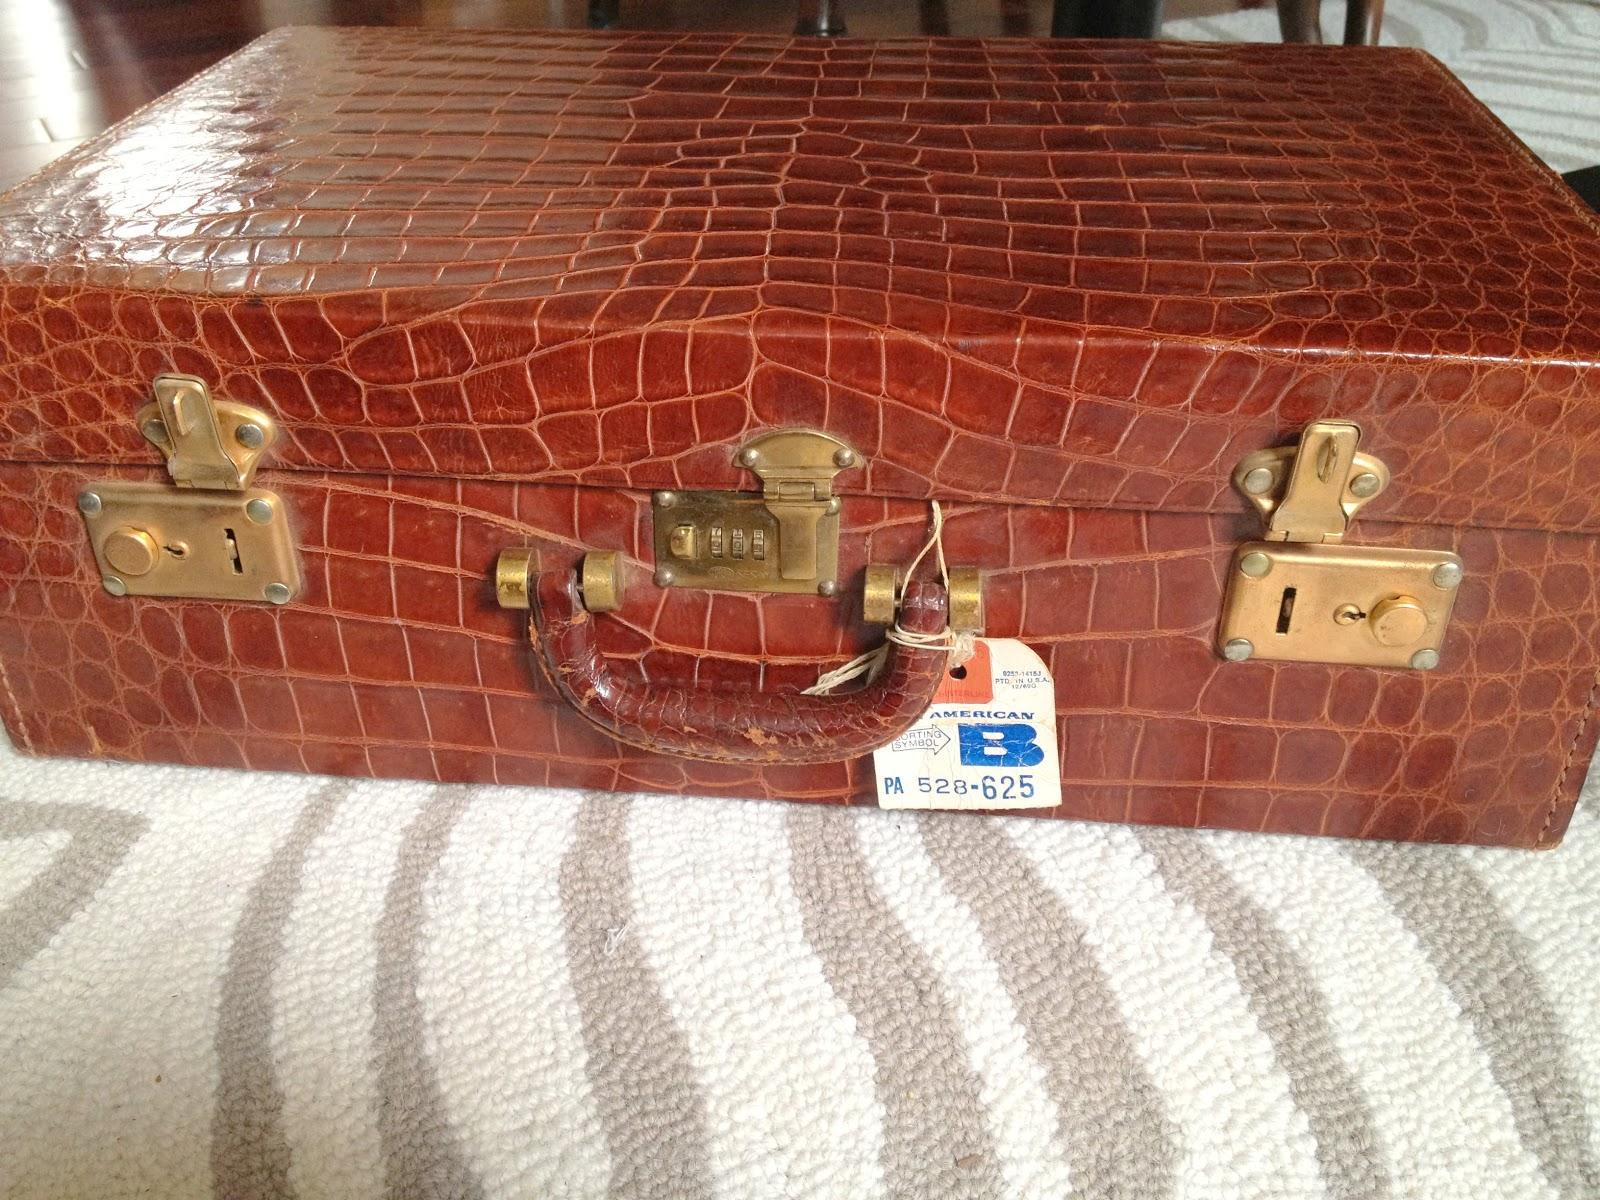 http://4.bp.blogspot.com/-gagqf1Sl2oc/TwxwGCpTL3I/AAAAAAAAApE/5DRgRe27OUk/s1600/suitcase.jpg